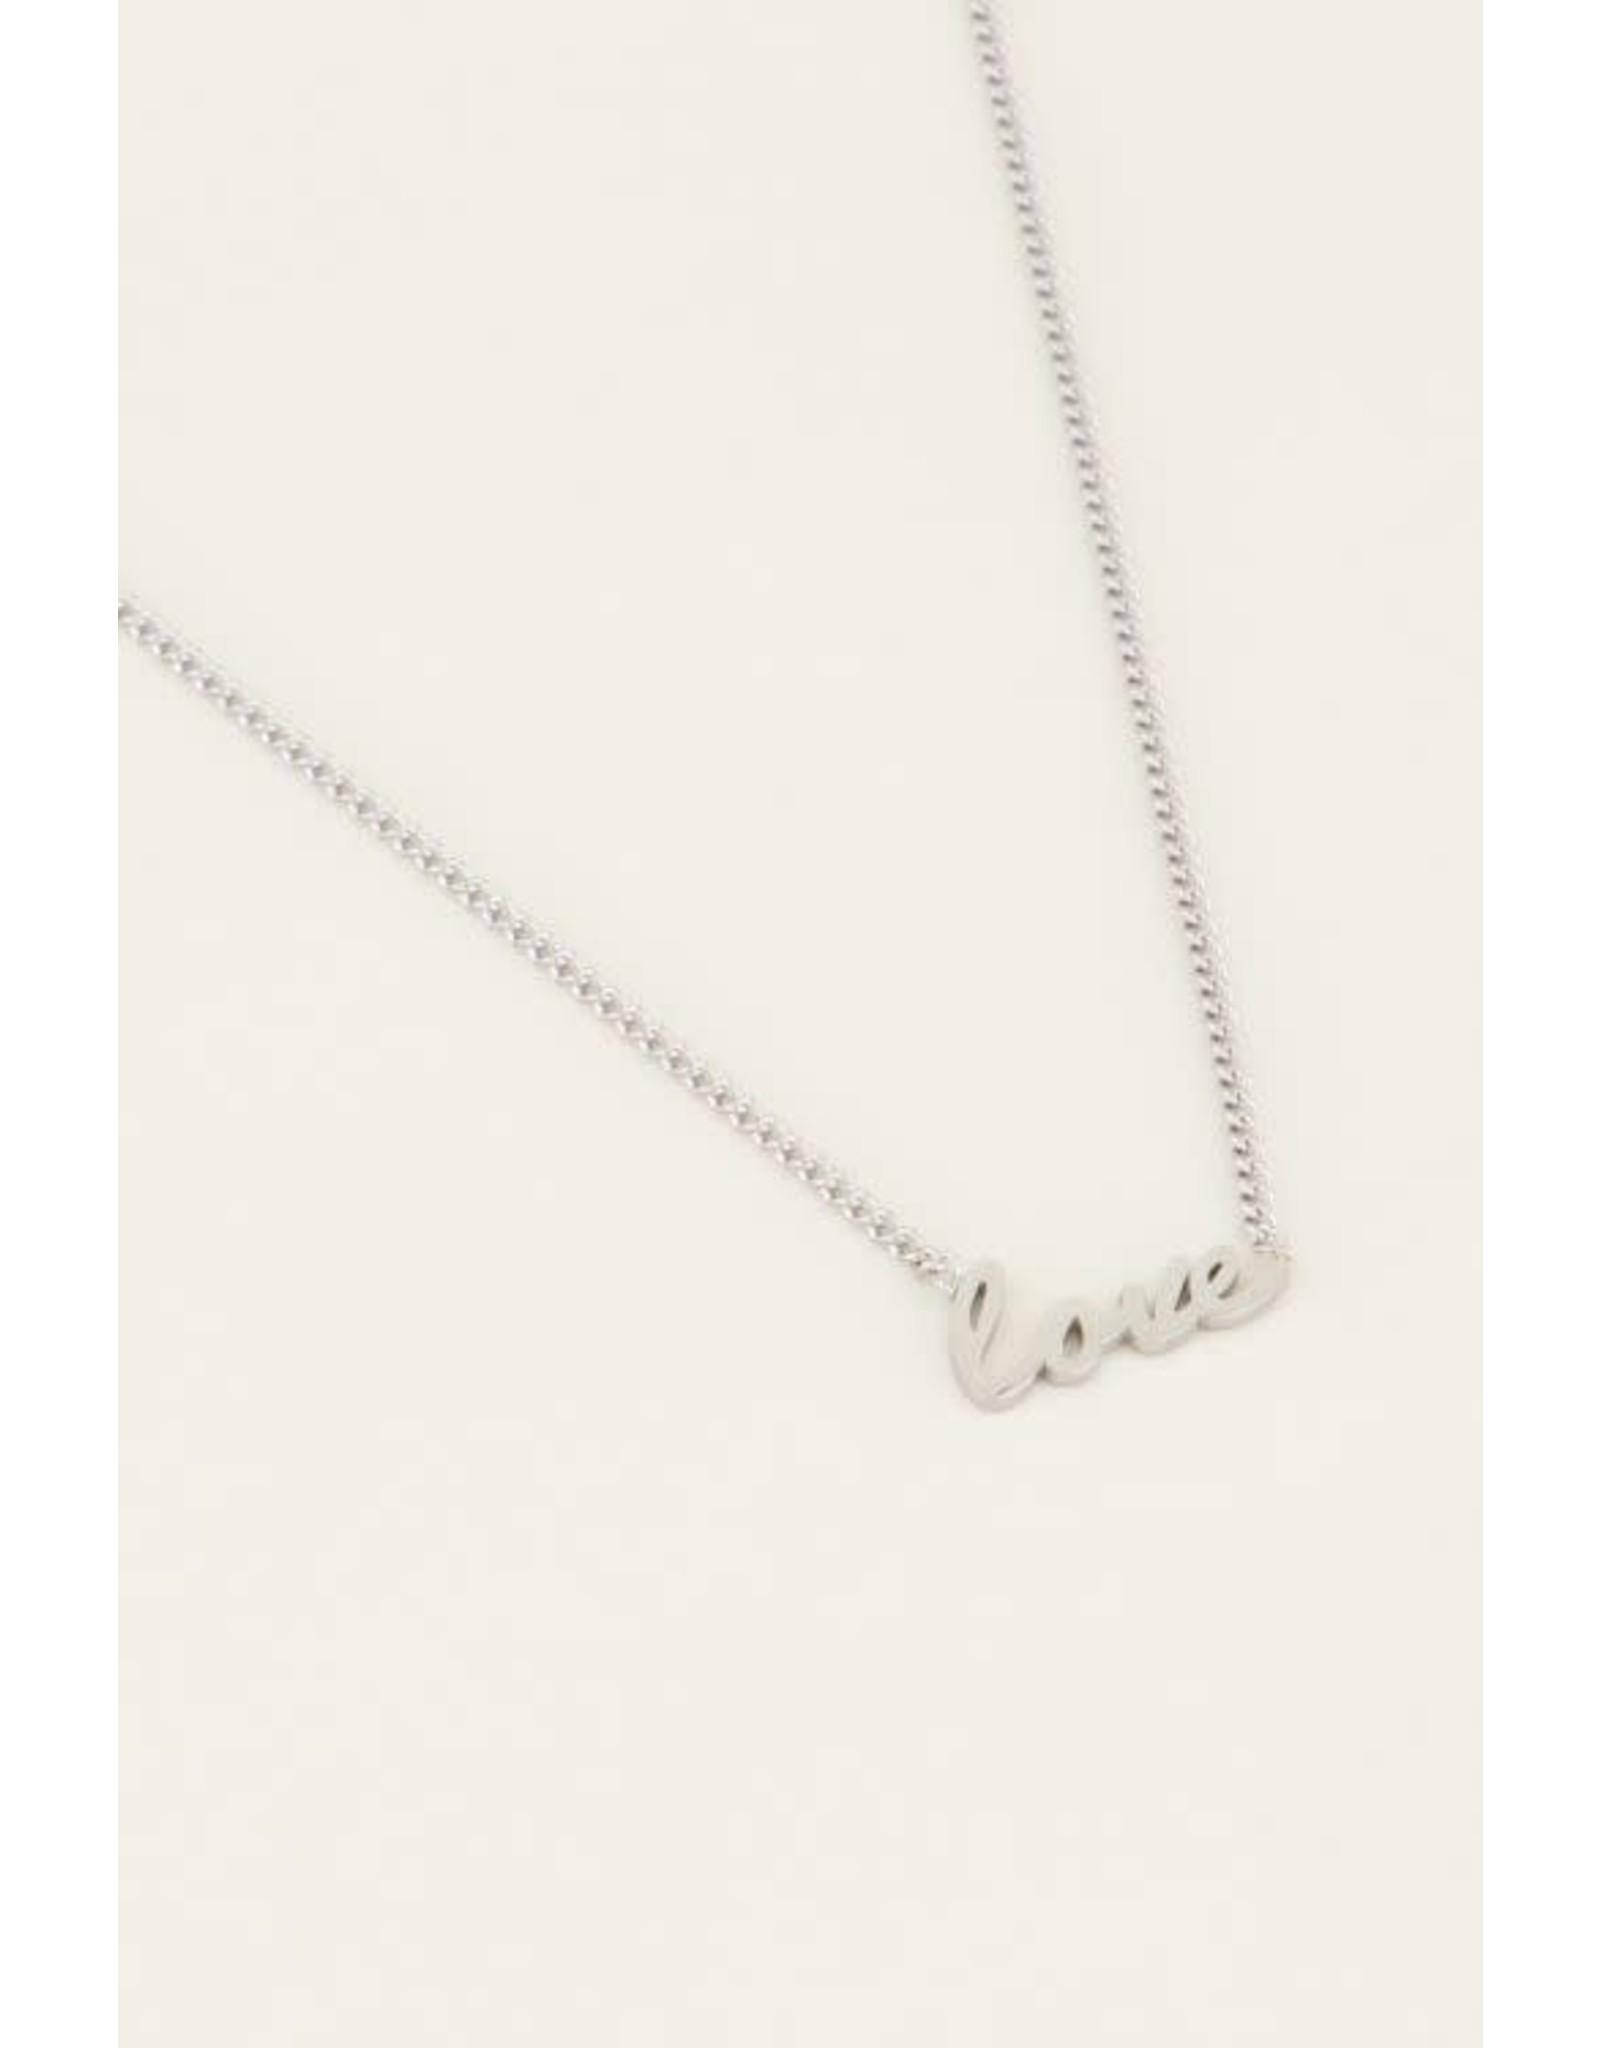 My Jewellery My Jewellery ketting love letters